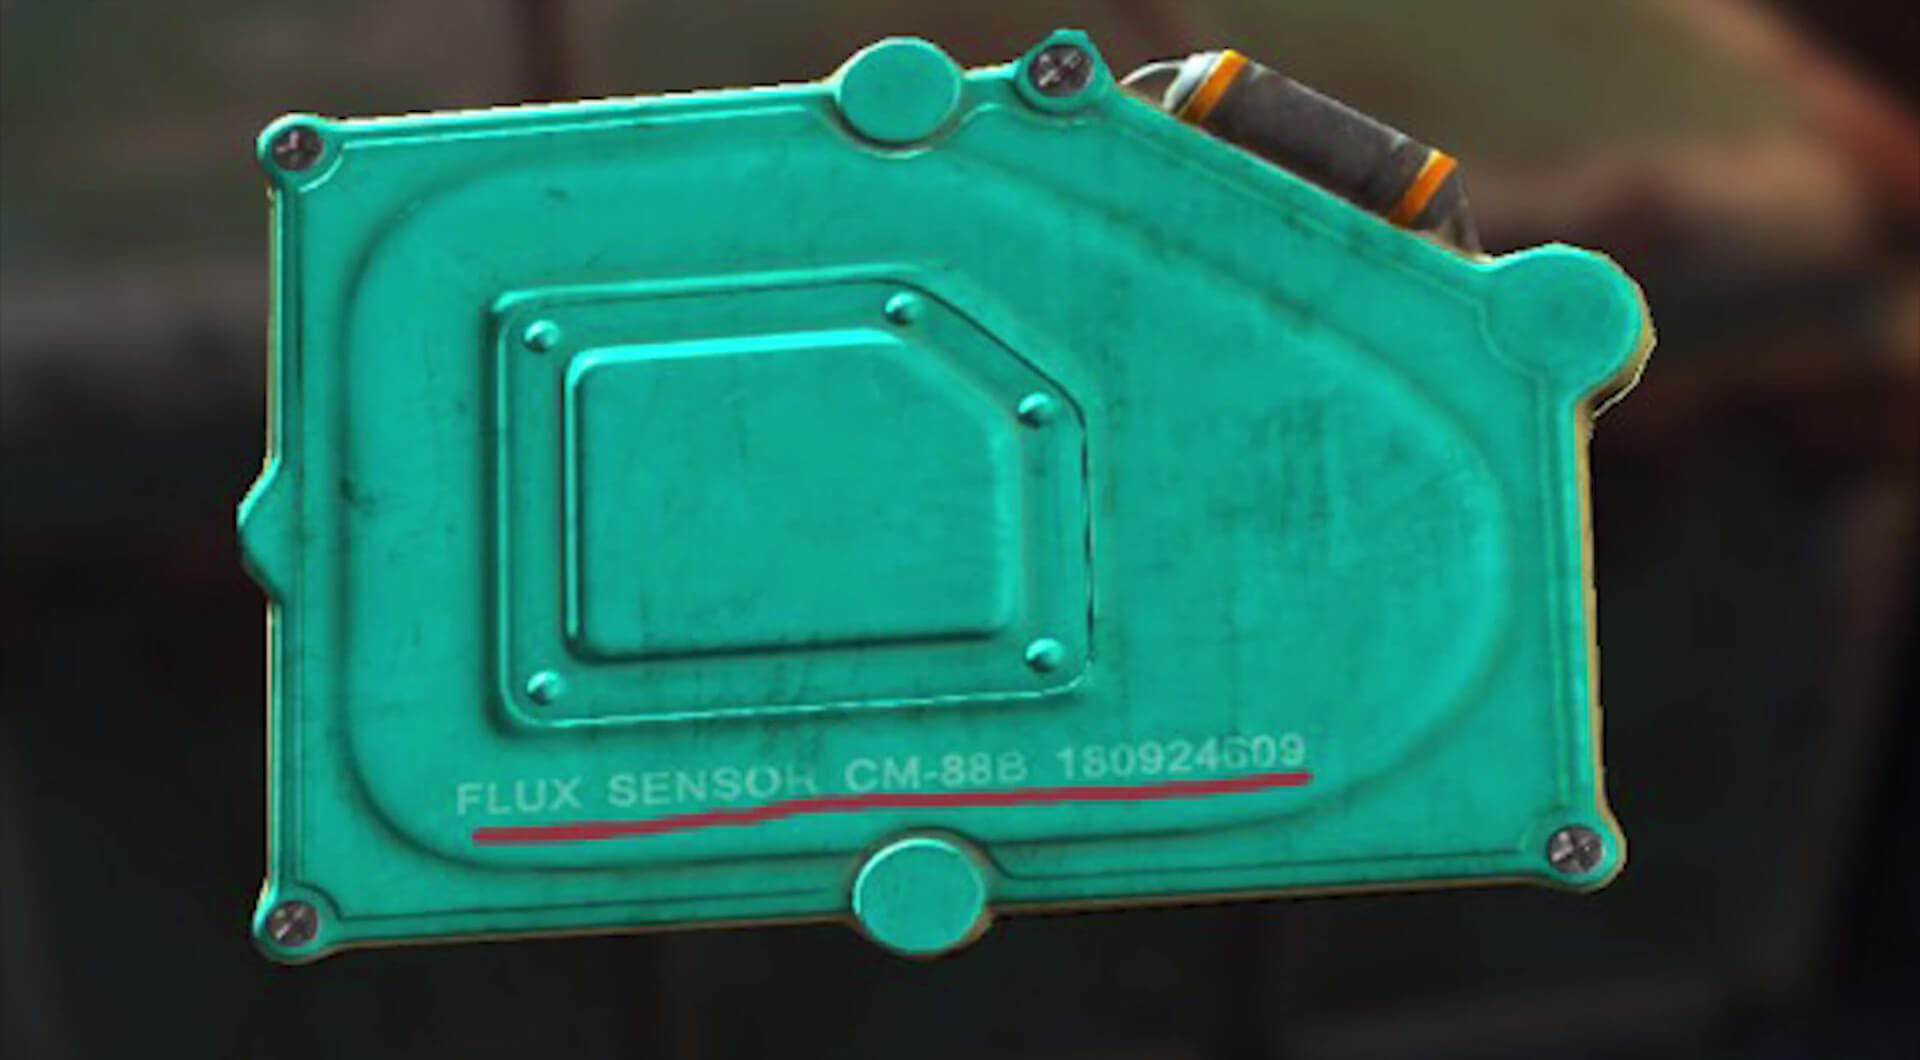 Fallout 4 secrets - Nostromo